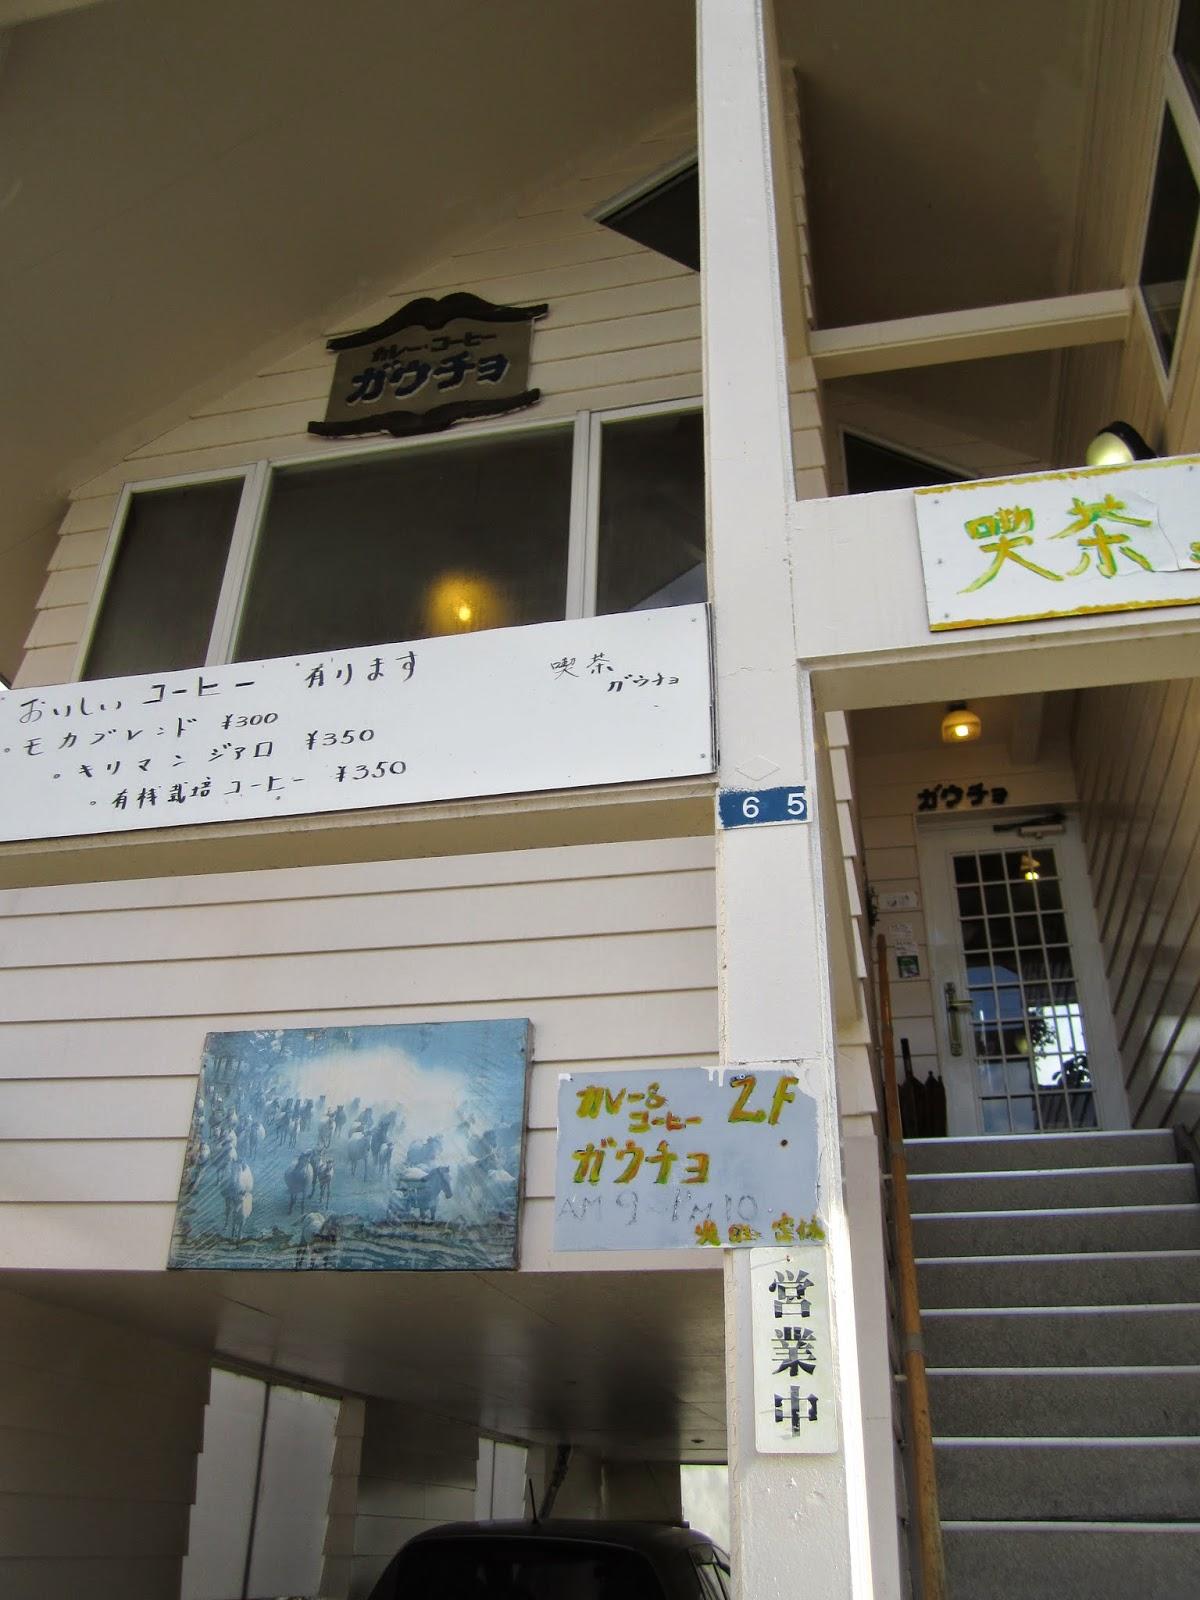 GauchoTowada Cafe ガウチョ 十和田市 カフェ